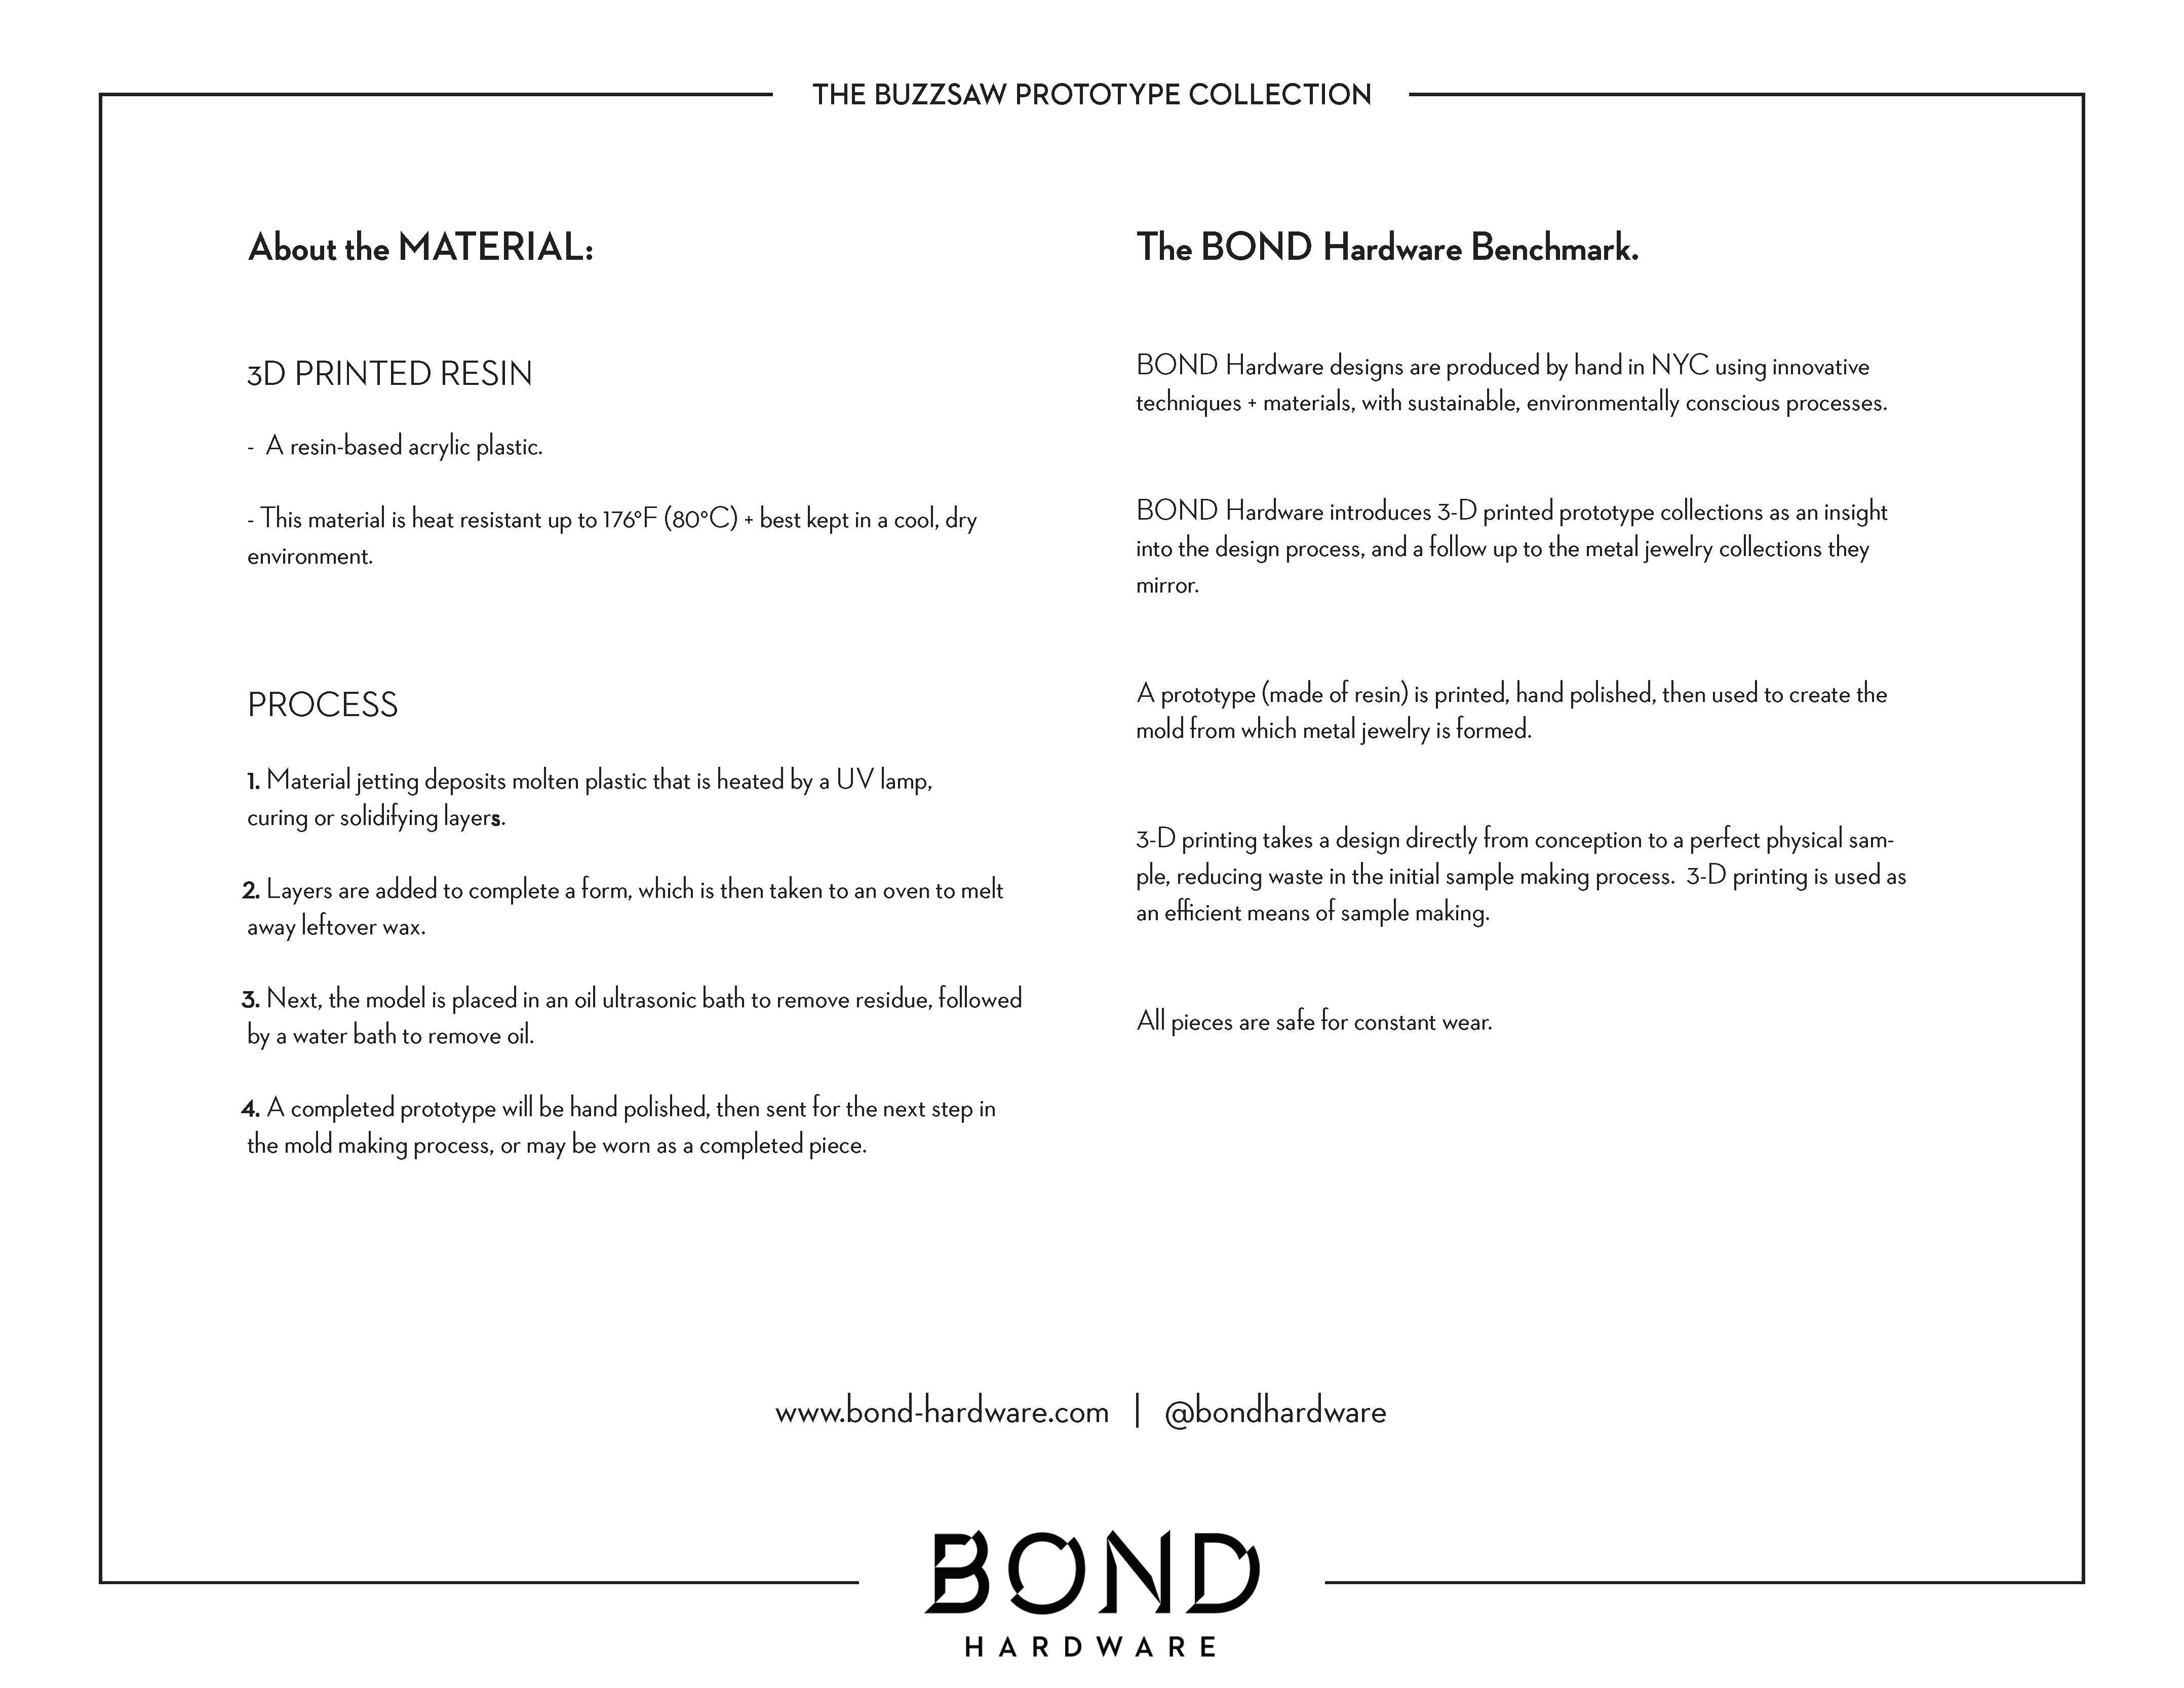 BOND-Hardware-Buzzsaw-Prototype-Lookbook-2018_Page_14